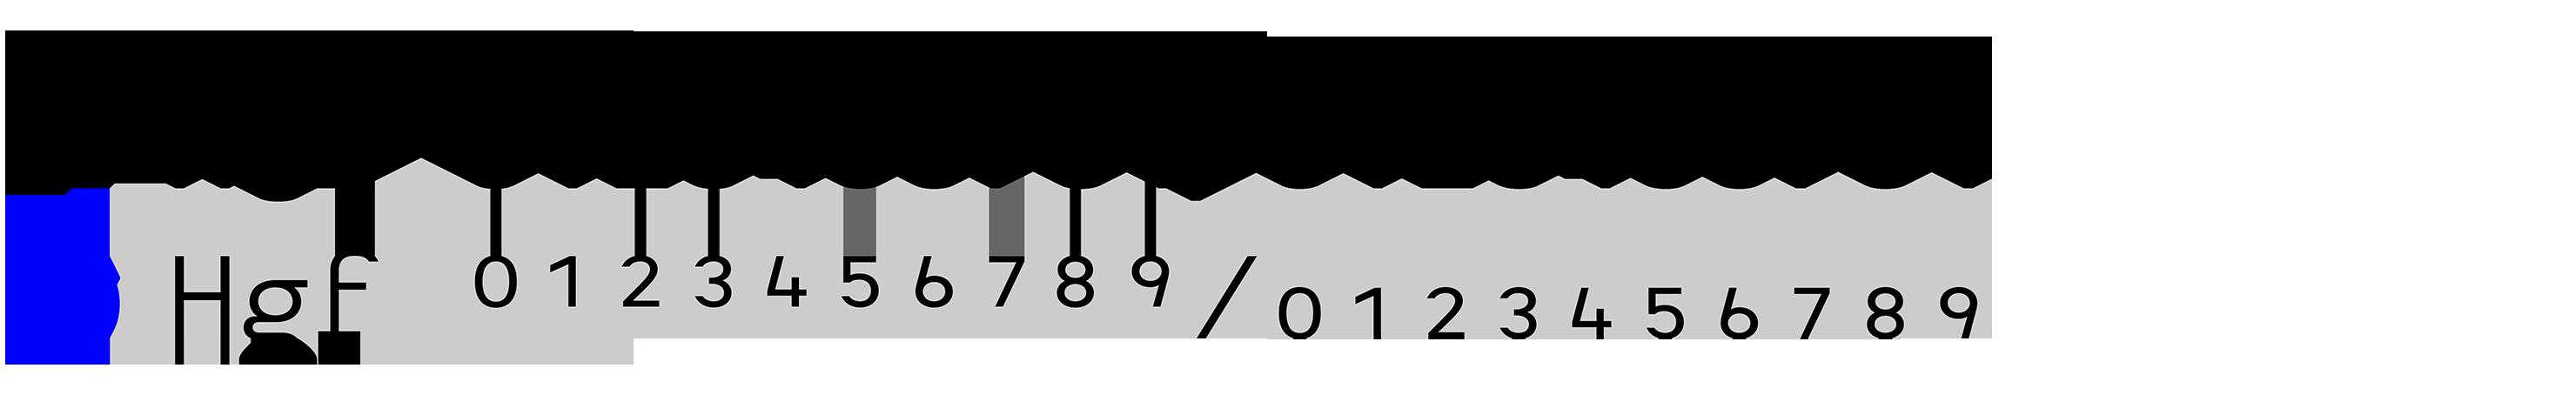 Typeface-Heimat-Mono-F13-Atlas-Font-Foundry